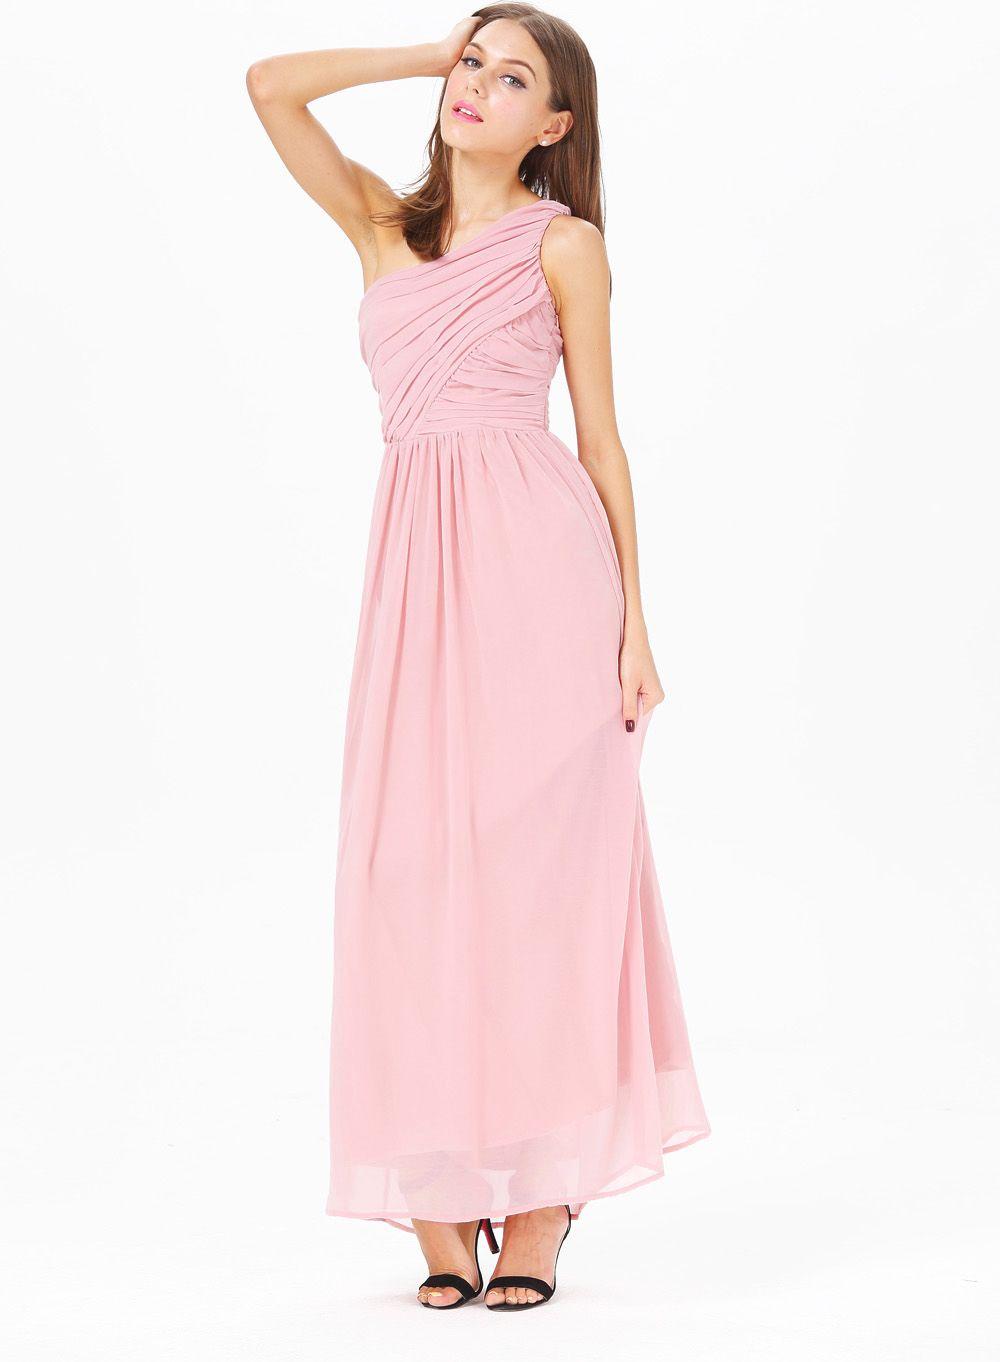 VESTIDO ESTILO GRIEGO Color: Rosa palo Talla: 36-S, 38-M, 40-L, 42 ...